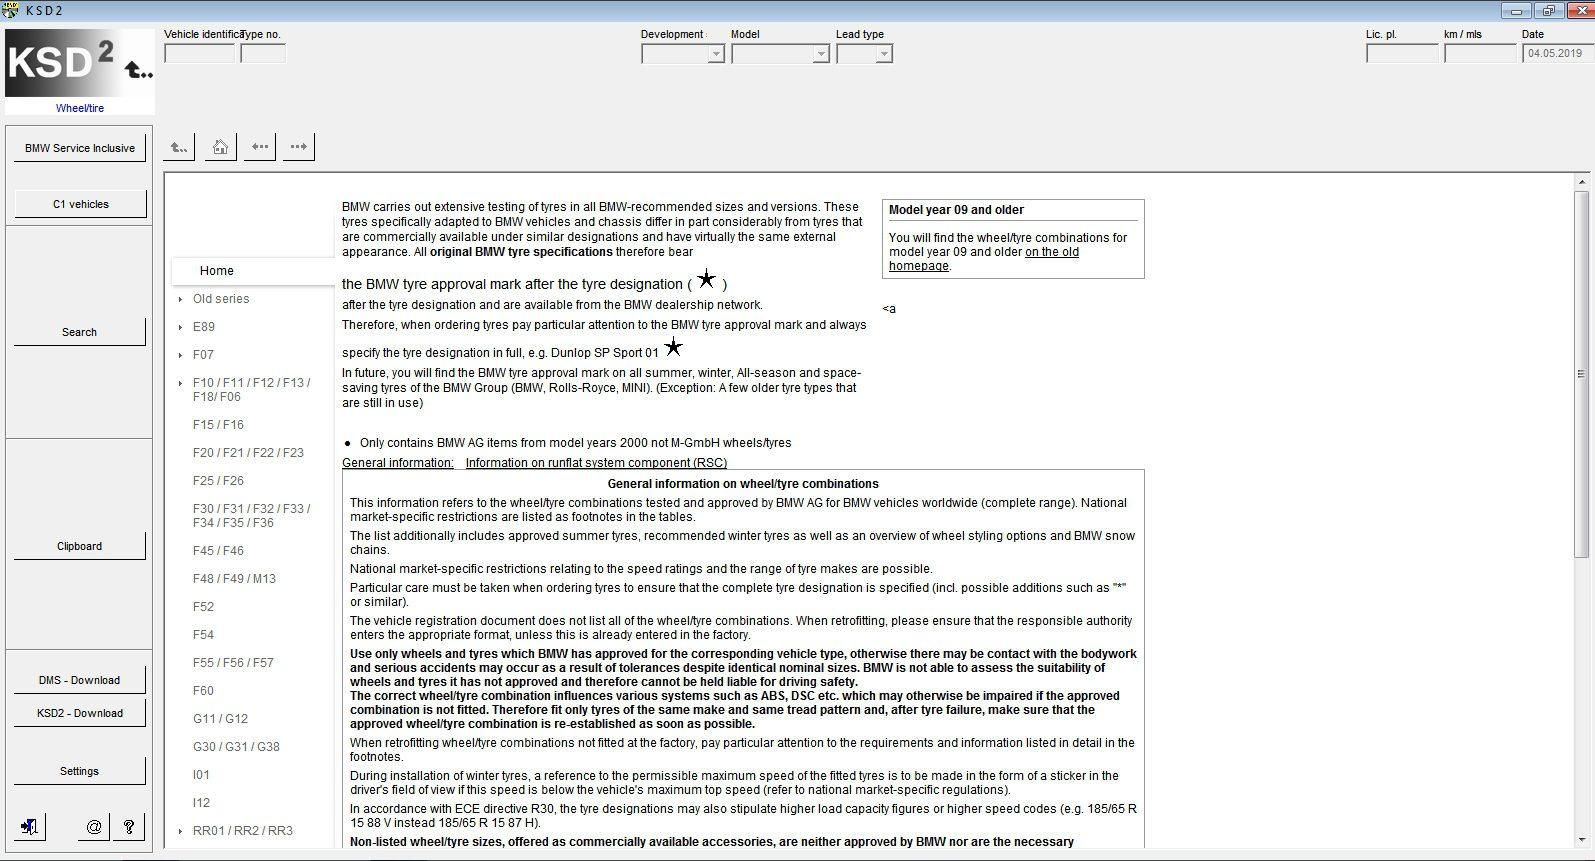 BMW_KSD2_052019_Service_Information_5